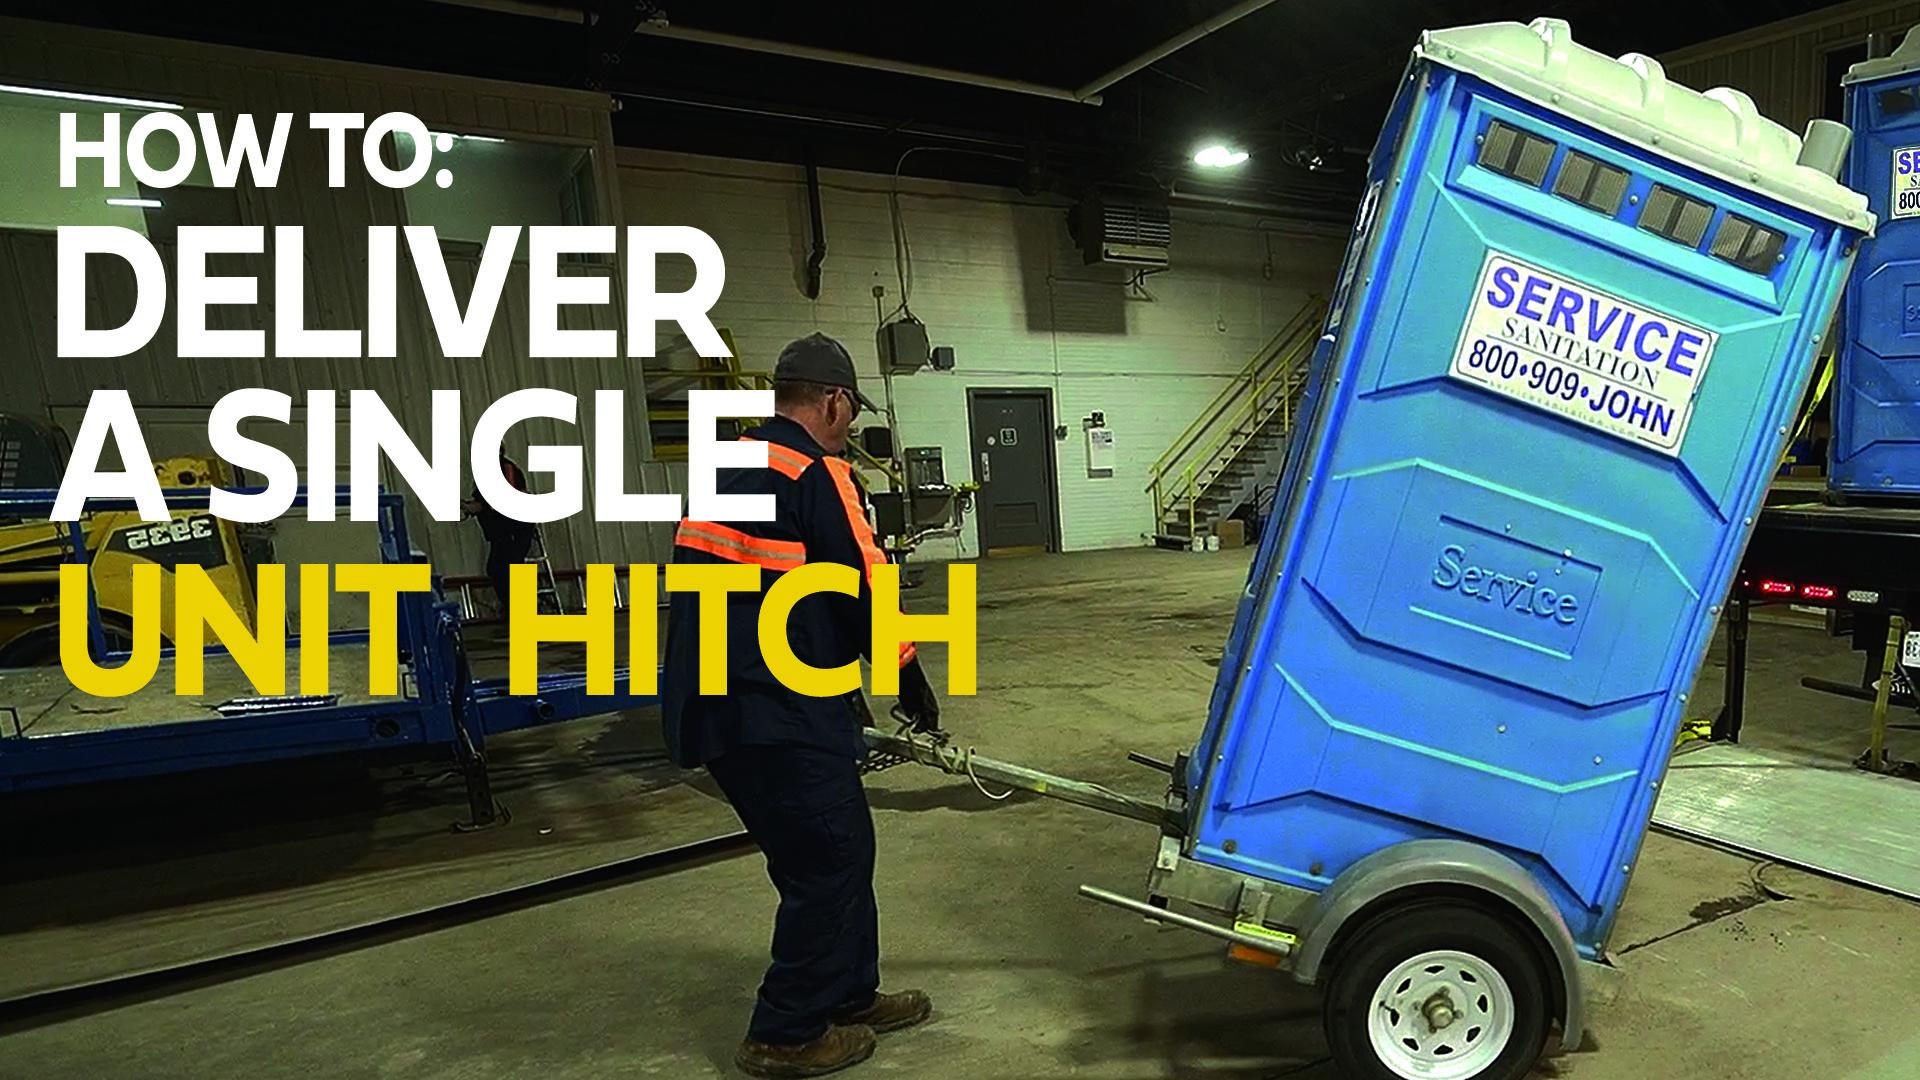 3. How to Setup & Deliver a Single Unit Hitch